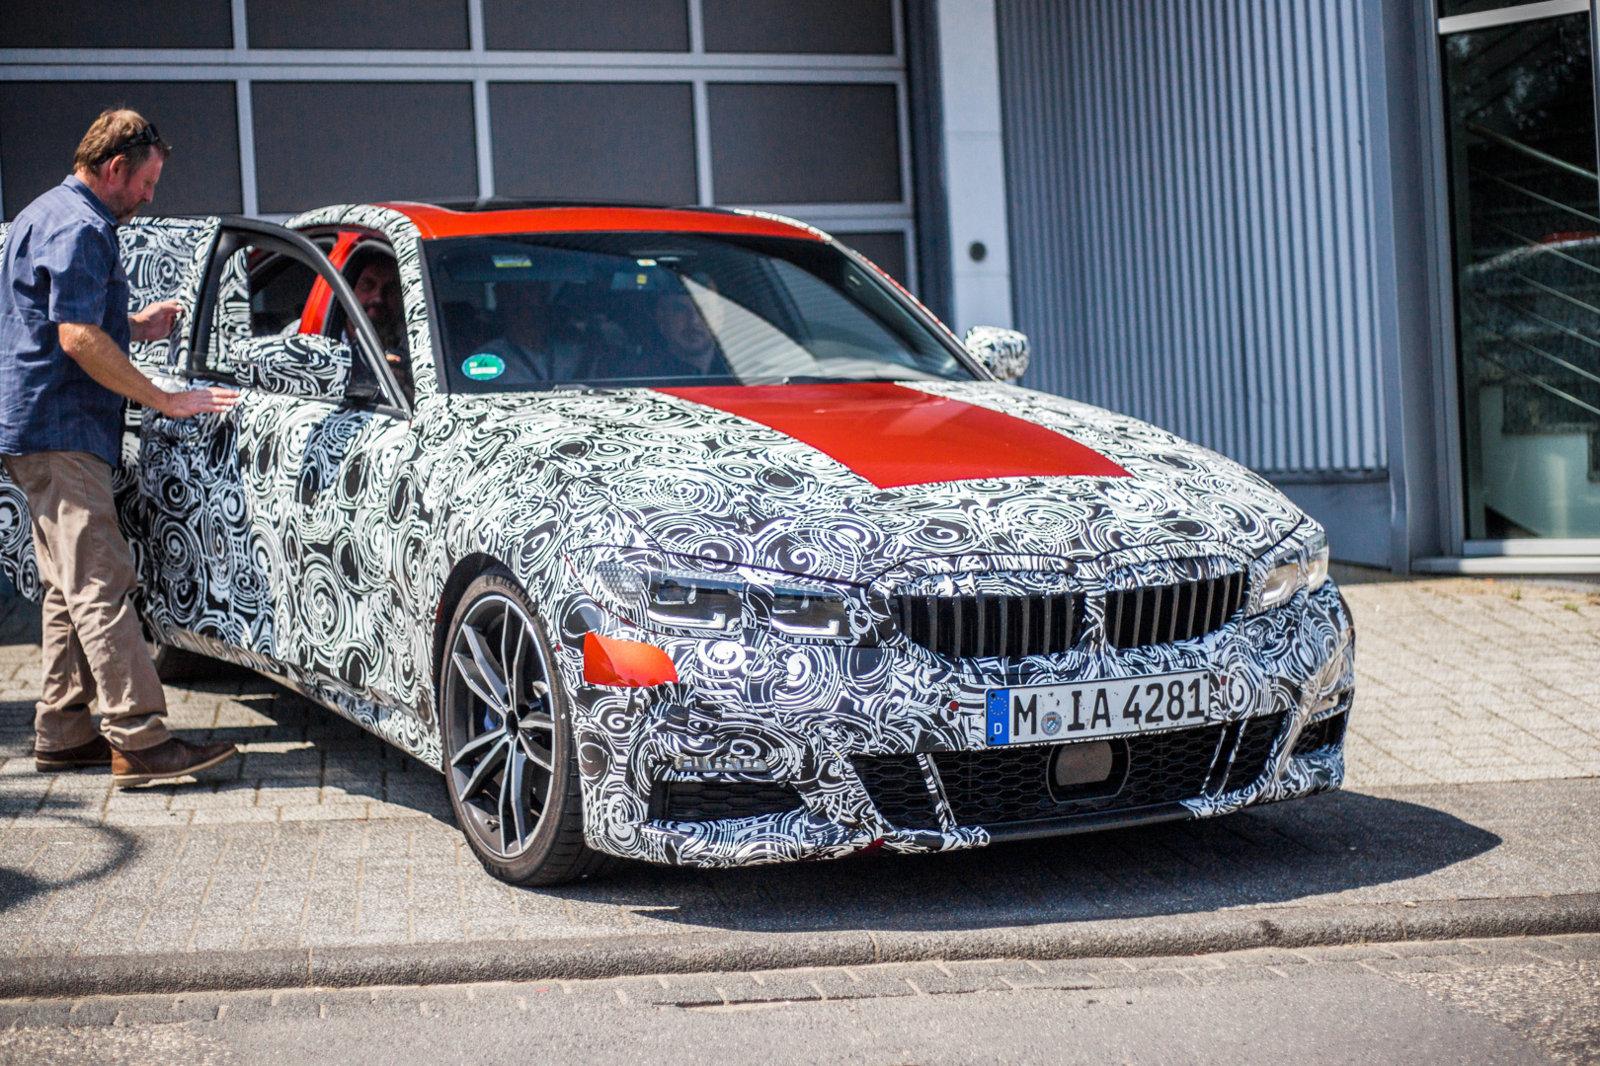 G20-BMW-3-Series-Spy-Photos-6.jpg